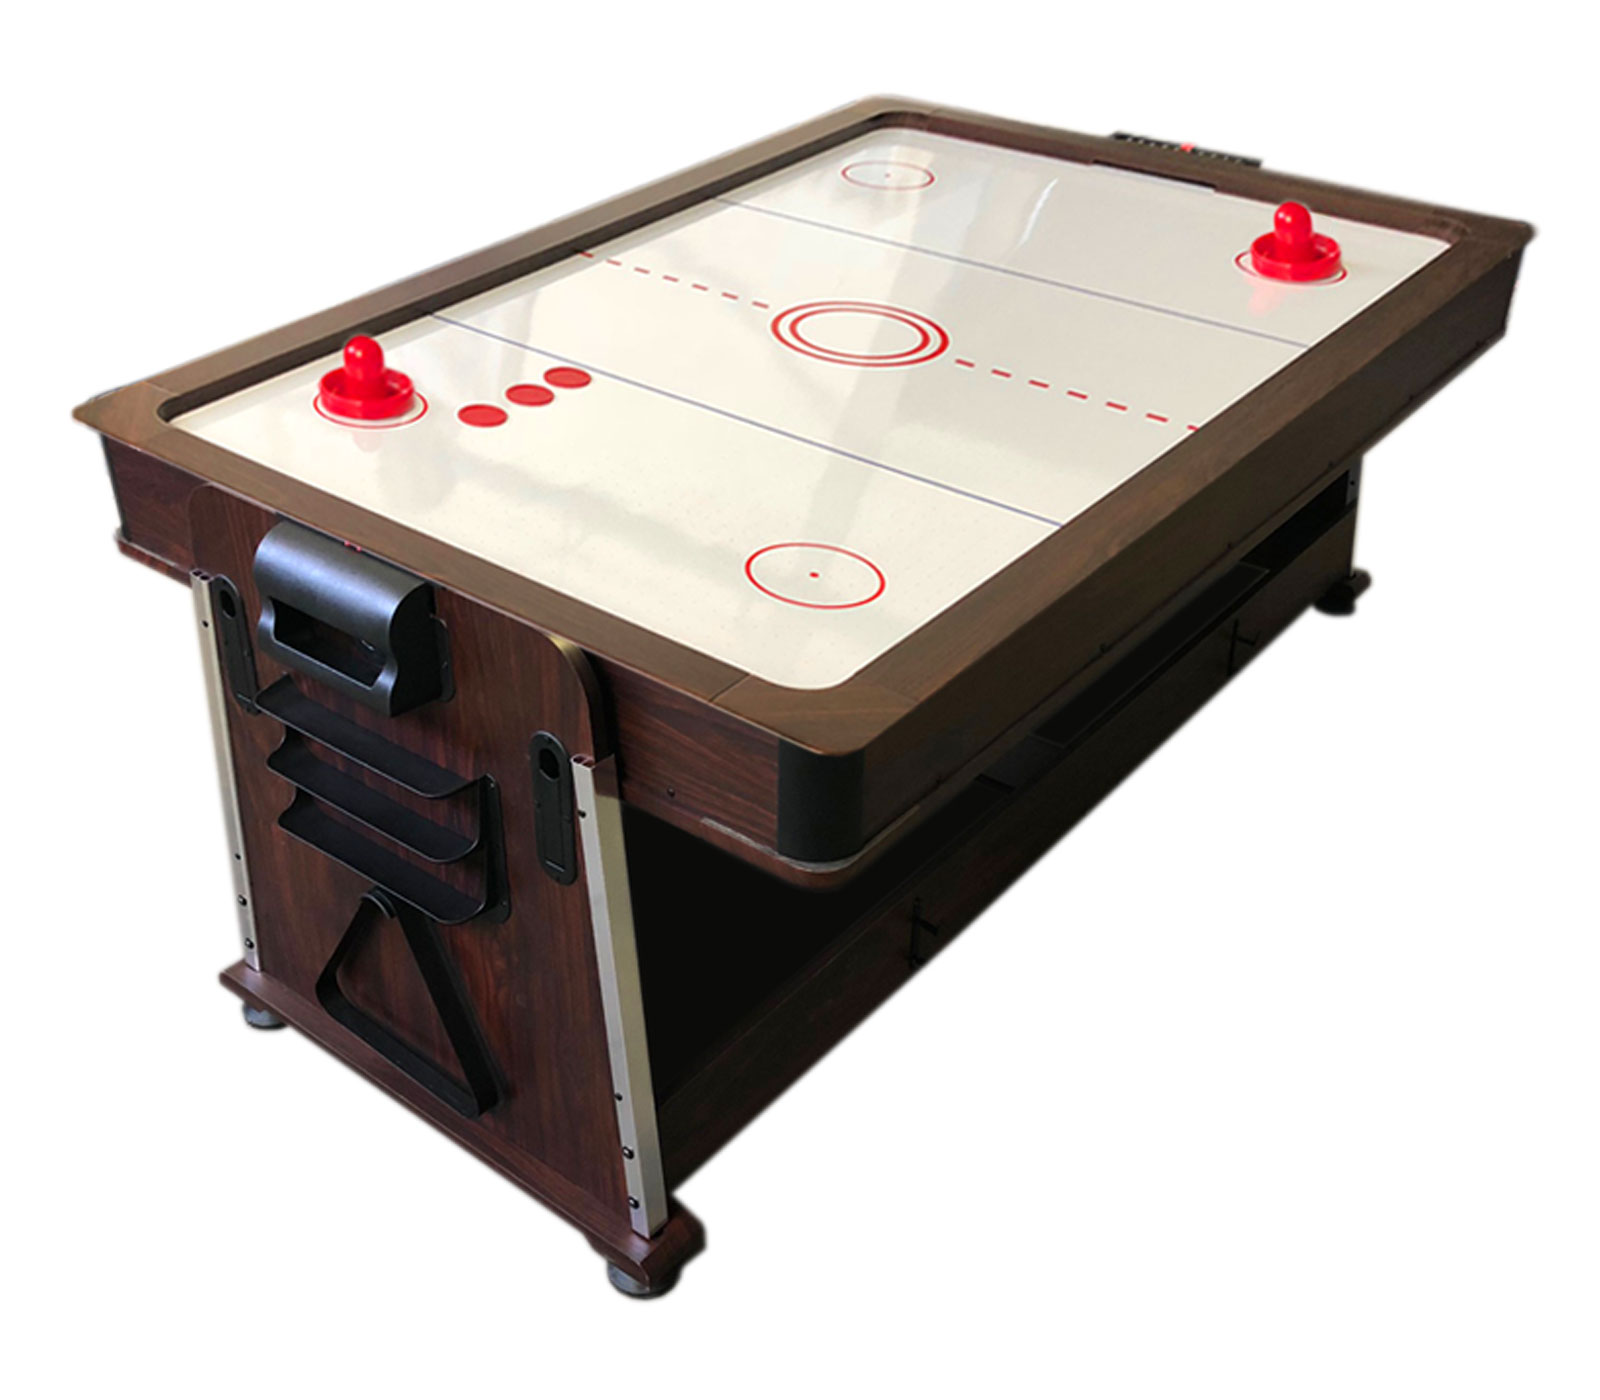 4 in 1 tavolo da biliardo 7 piedi air hockey ping pong tavolo da pranzo mattew - Tavolo da pranzo con biliardo ...